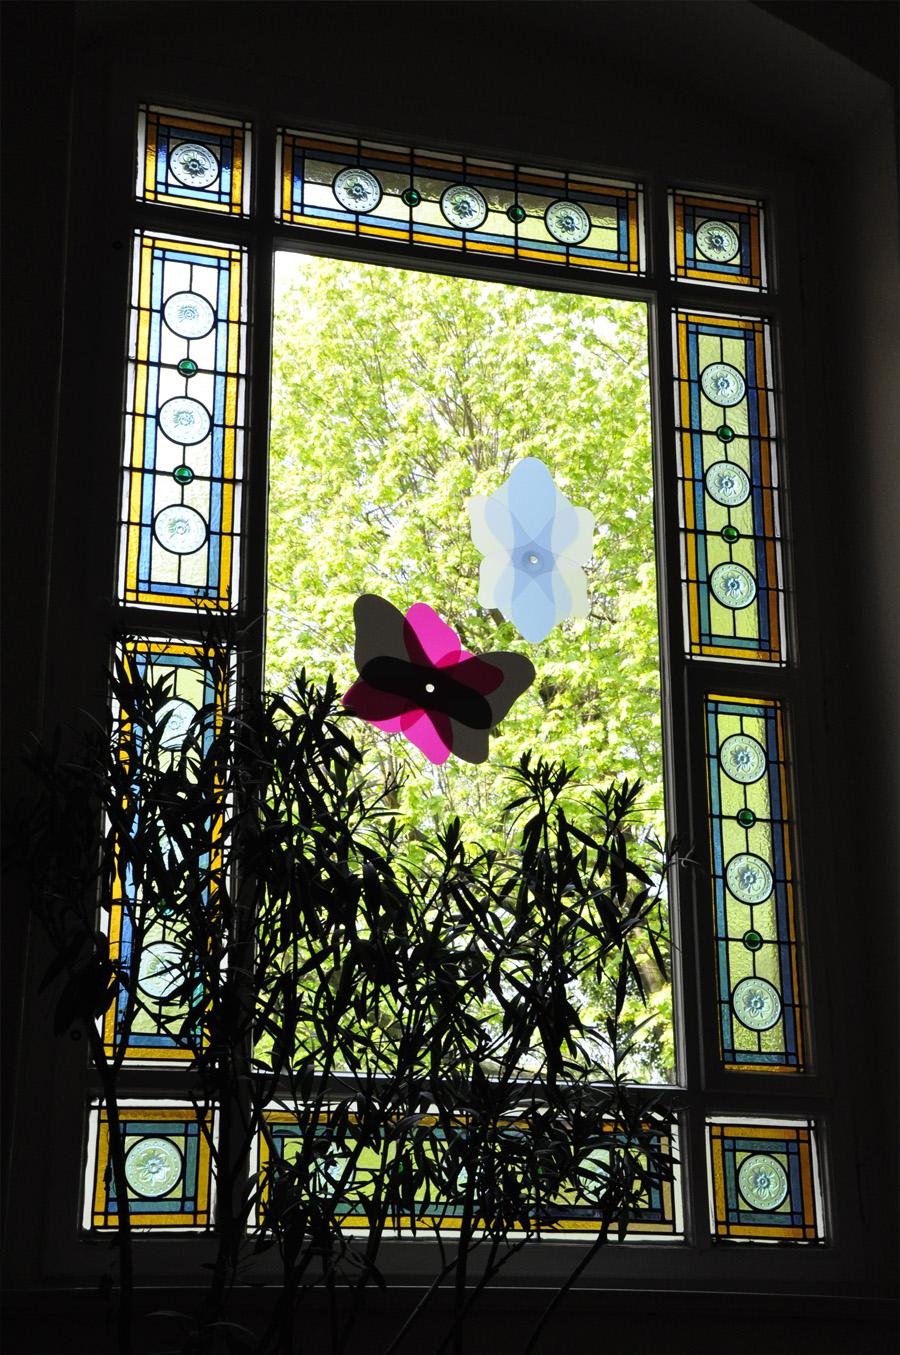 Freydenberg_Trans_Flower_Butterfly_32.jpg